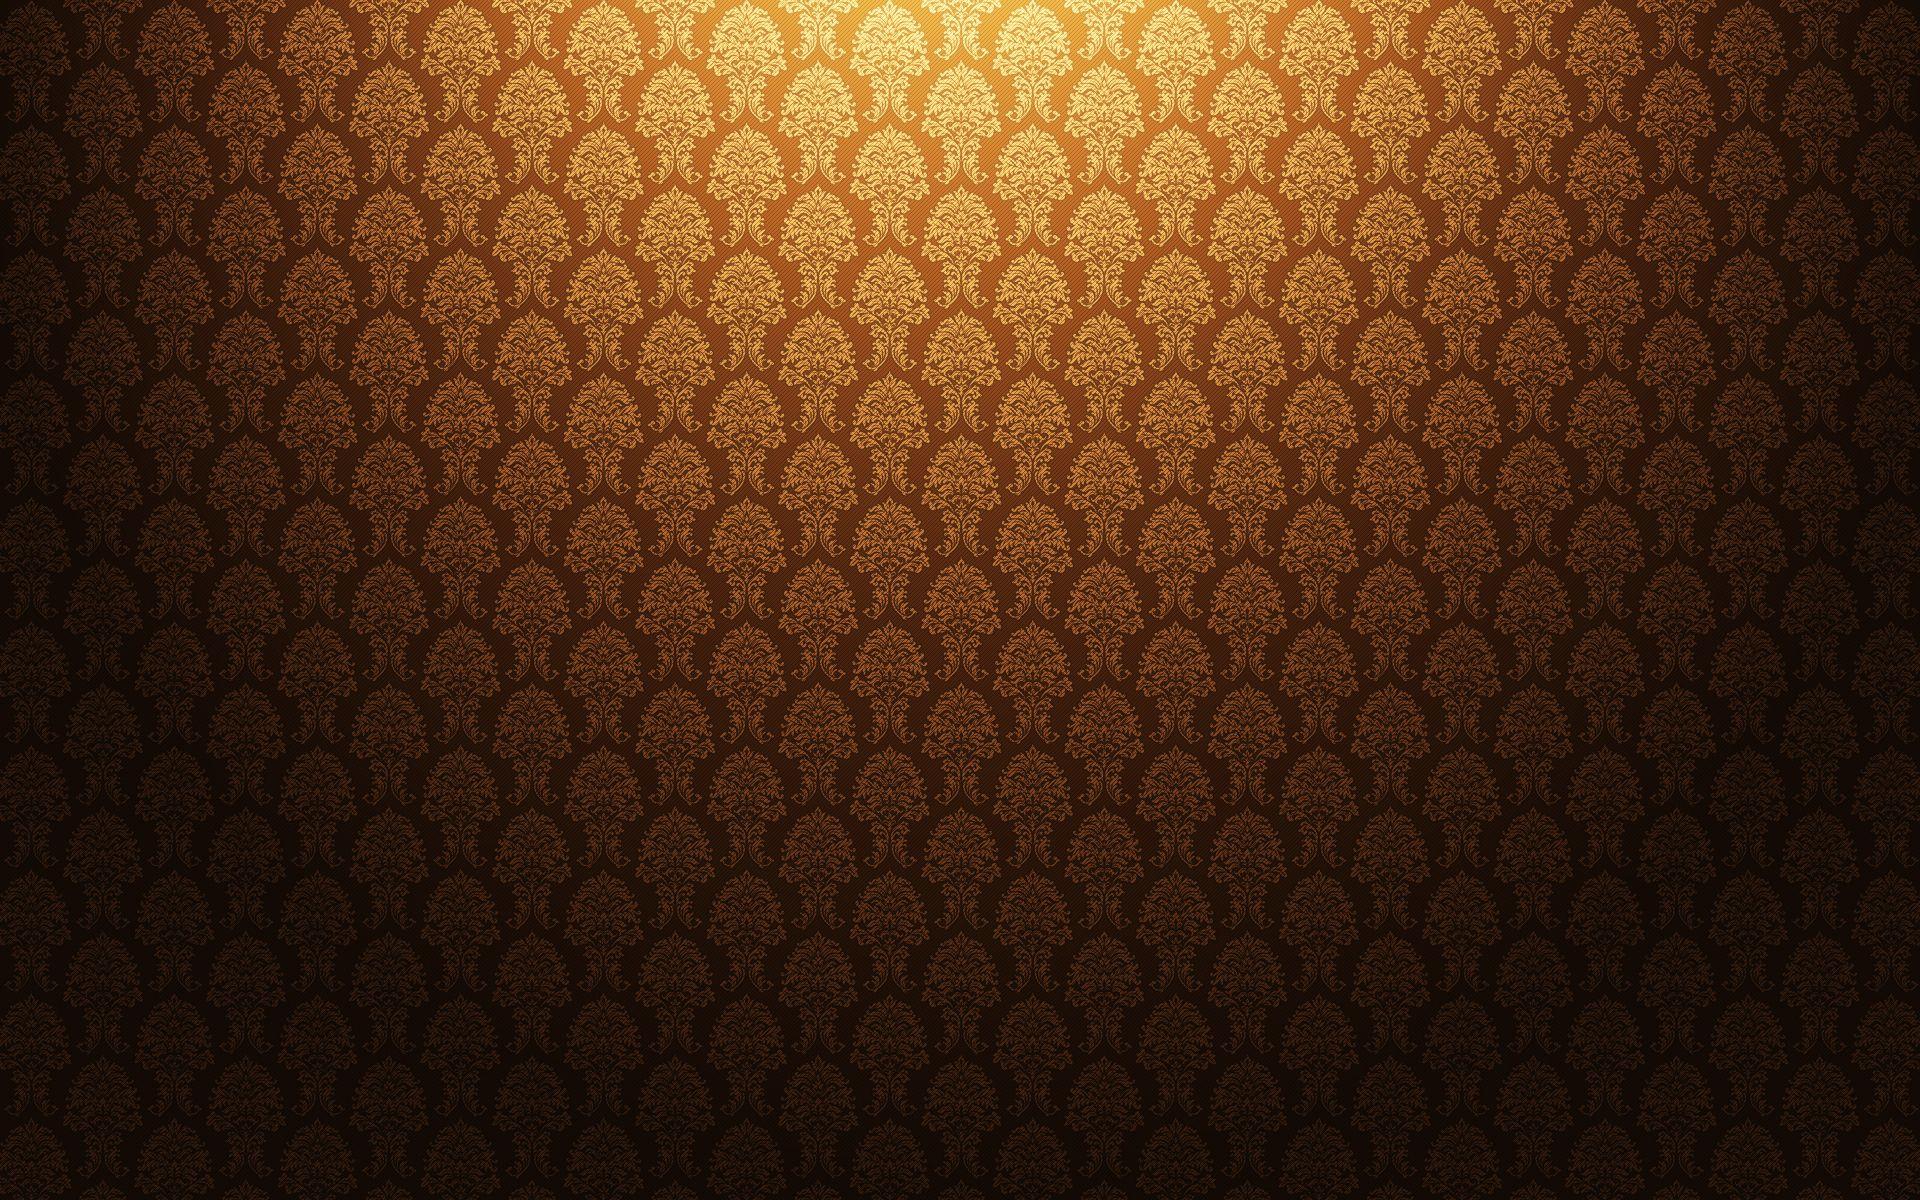 Golden Vintage Wallpaper By EddLi On DeviantART